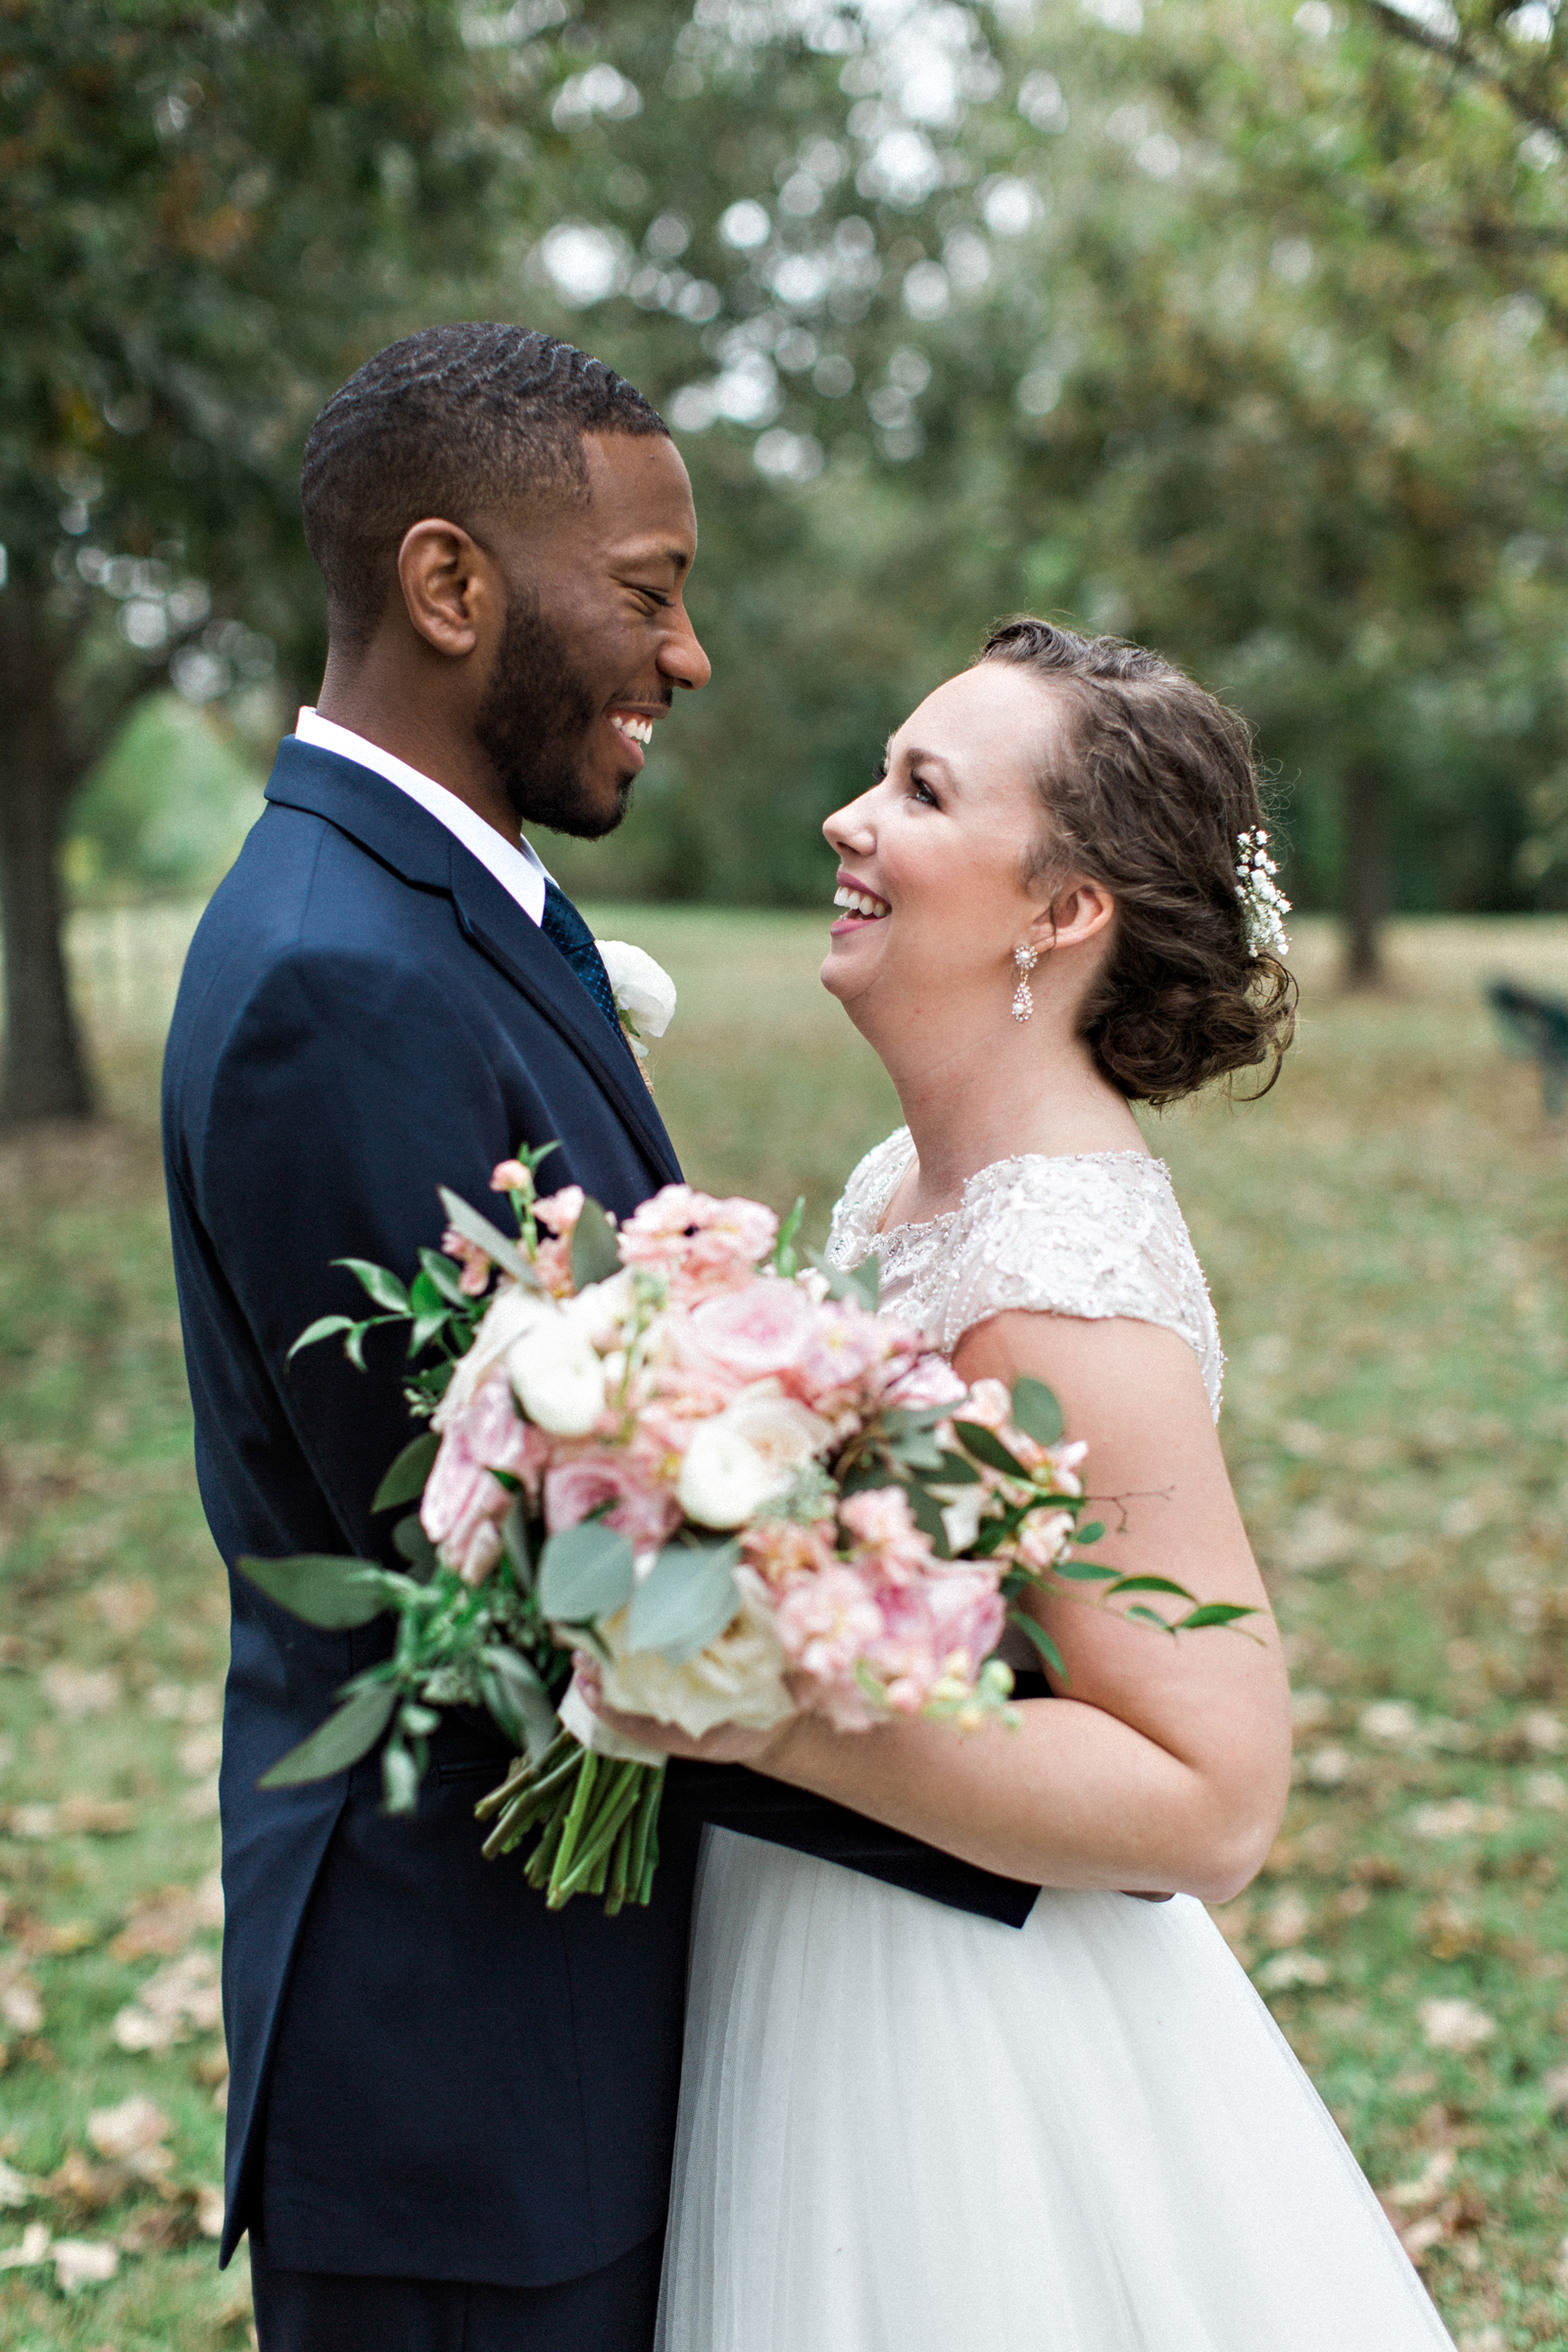 Alabama-Wedding-Photography-Nick-Drollette-Cory-Laura-124.jpg